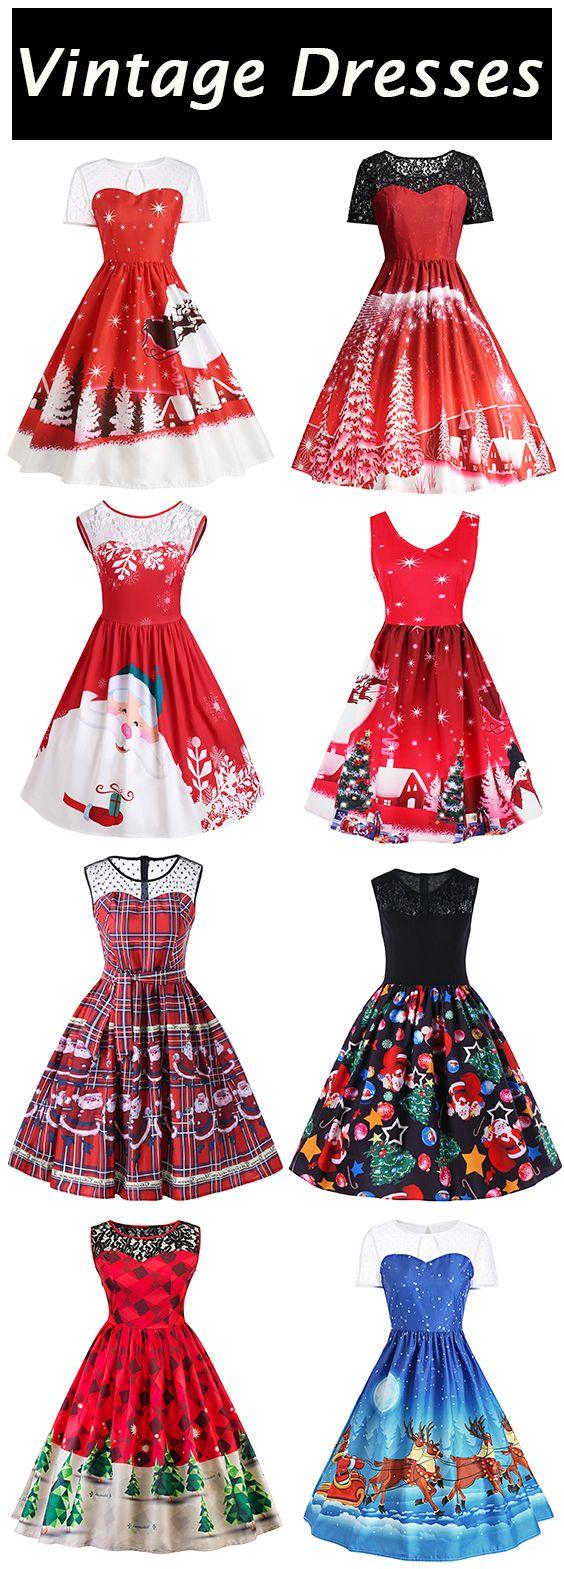 50 Christmas Vintage Dresses Free Shipping Worldwide Vintage Christmas Dress Vintage Dresses 1940s Vintage Dresses